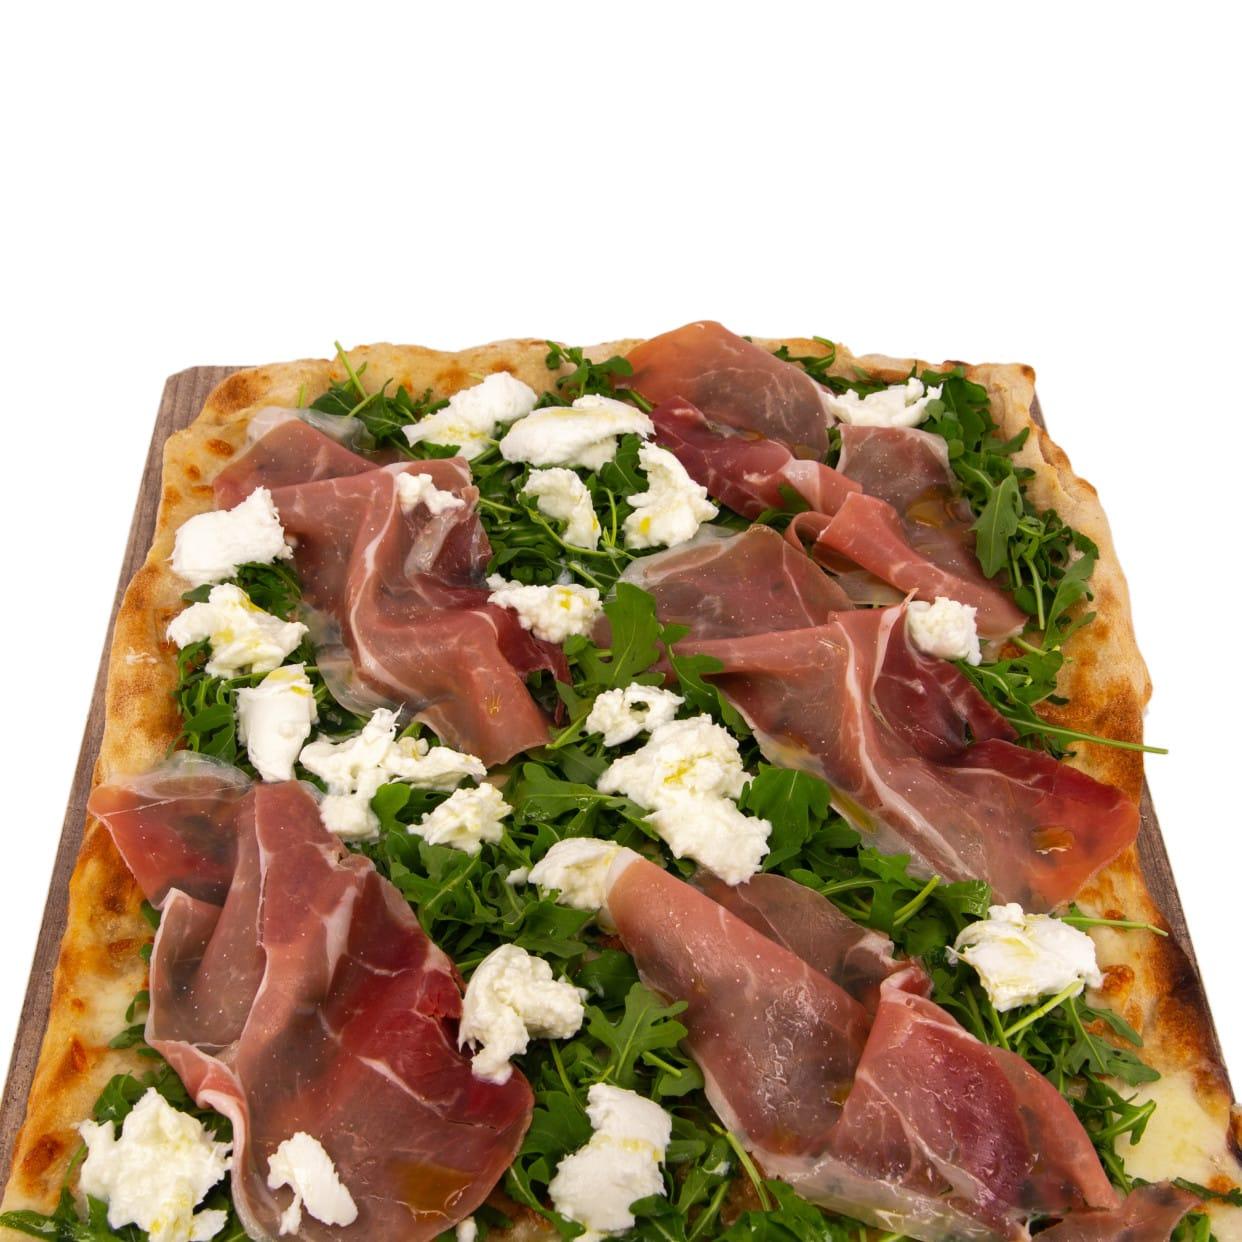 Pizza rossa crudo e bufala - pala intera